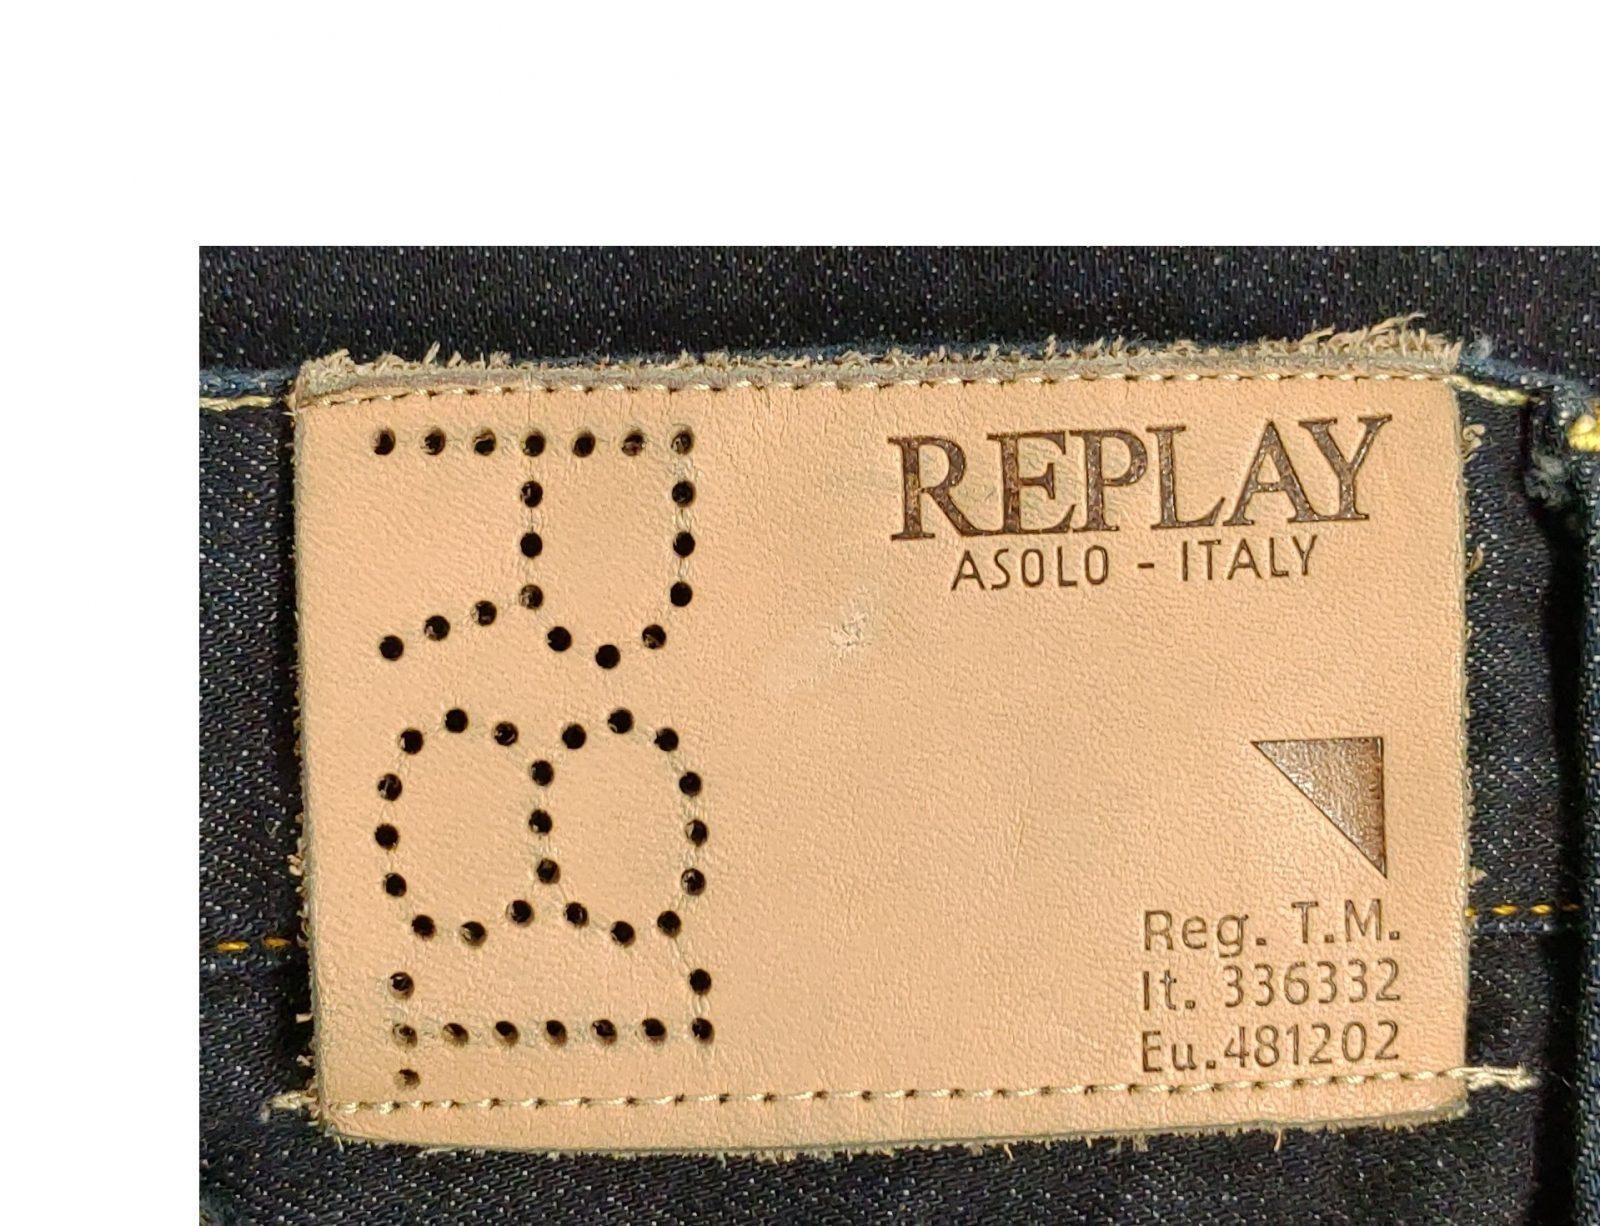 Логотип бренда Replay - История бренда Replay